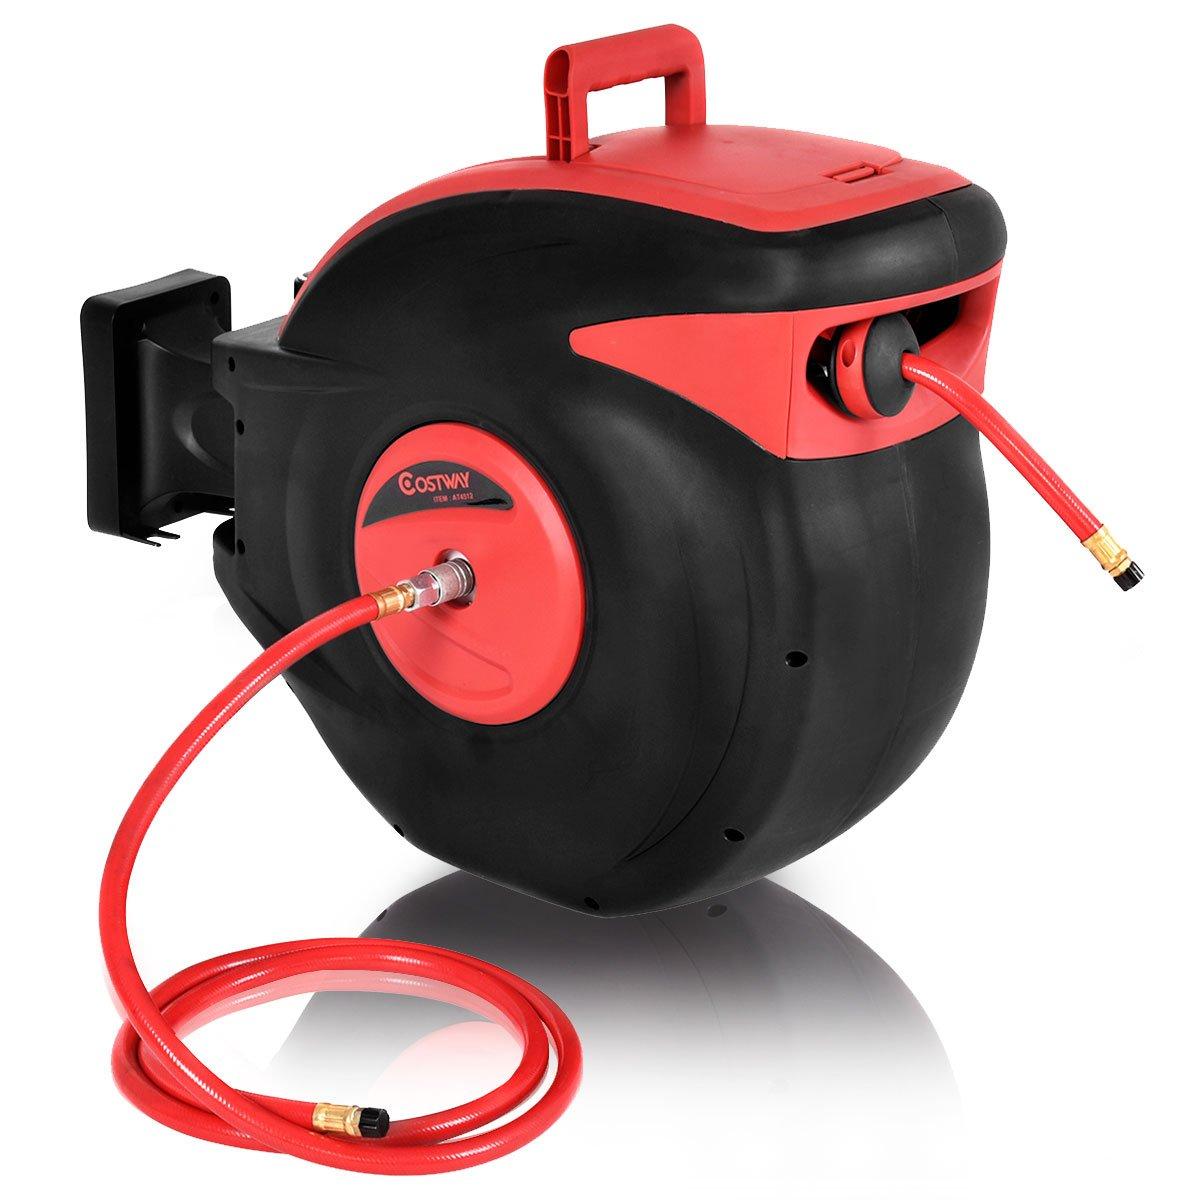 COSTWAY 3/8 x 100' Retractable Auto Rewind Air Hose Reel Tools Compressor 300 PSI Garage For Auto Repair